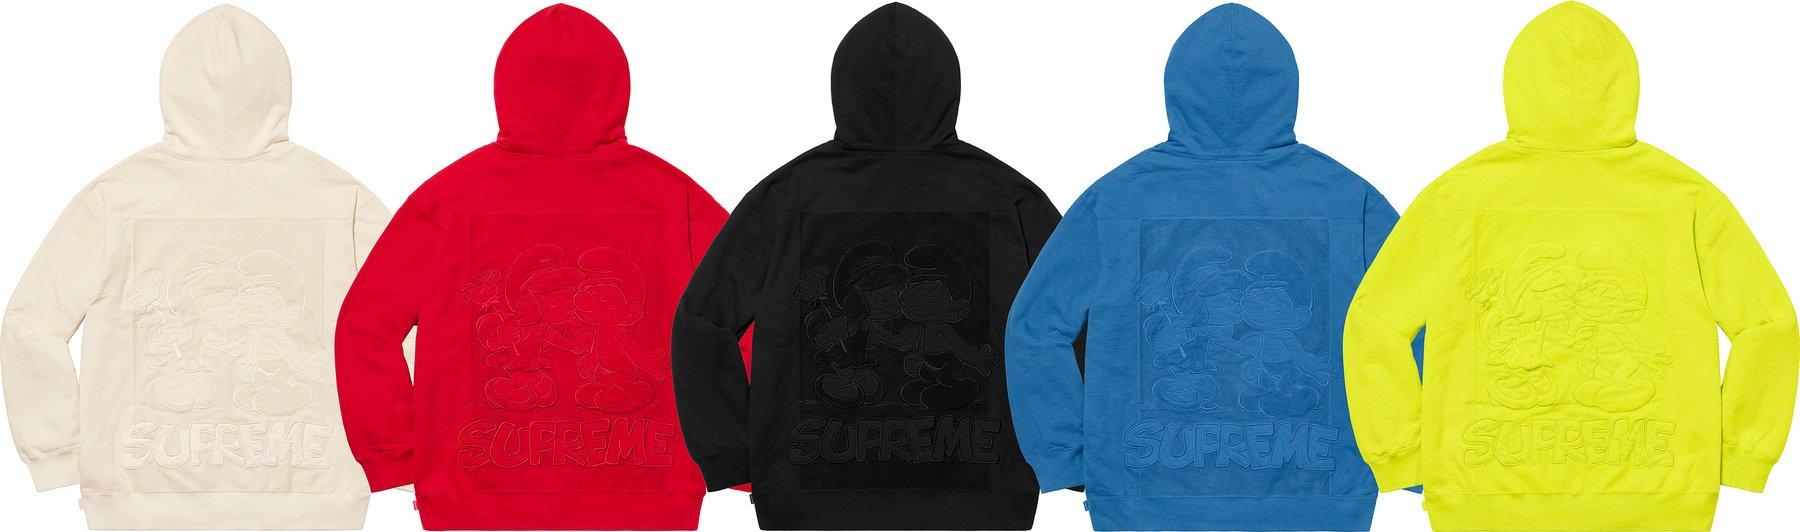 Supreme 2020fw week6 Supreme Smurfs Hooded Sweatshirt シュプリーム 2020年 秋冬 スマーフ スウェットシャツ 5 colors